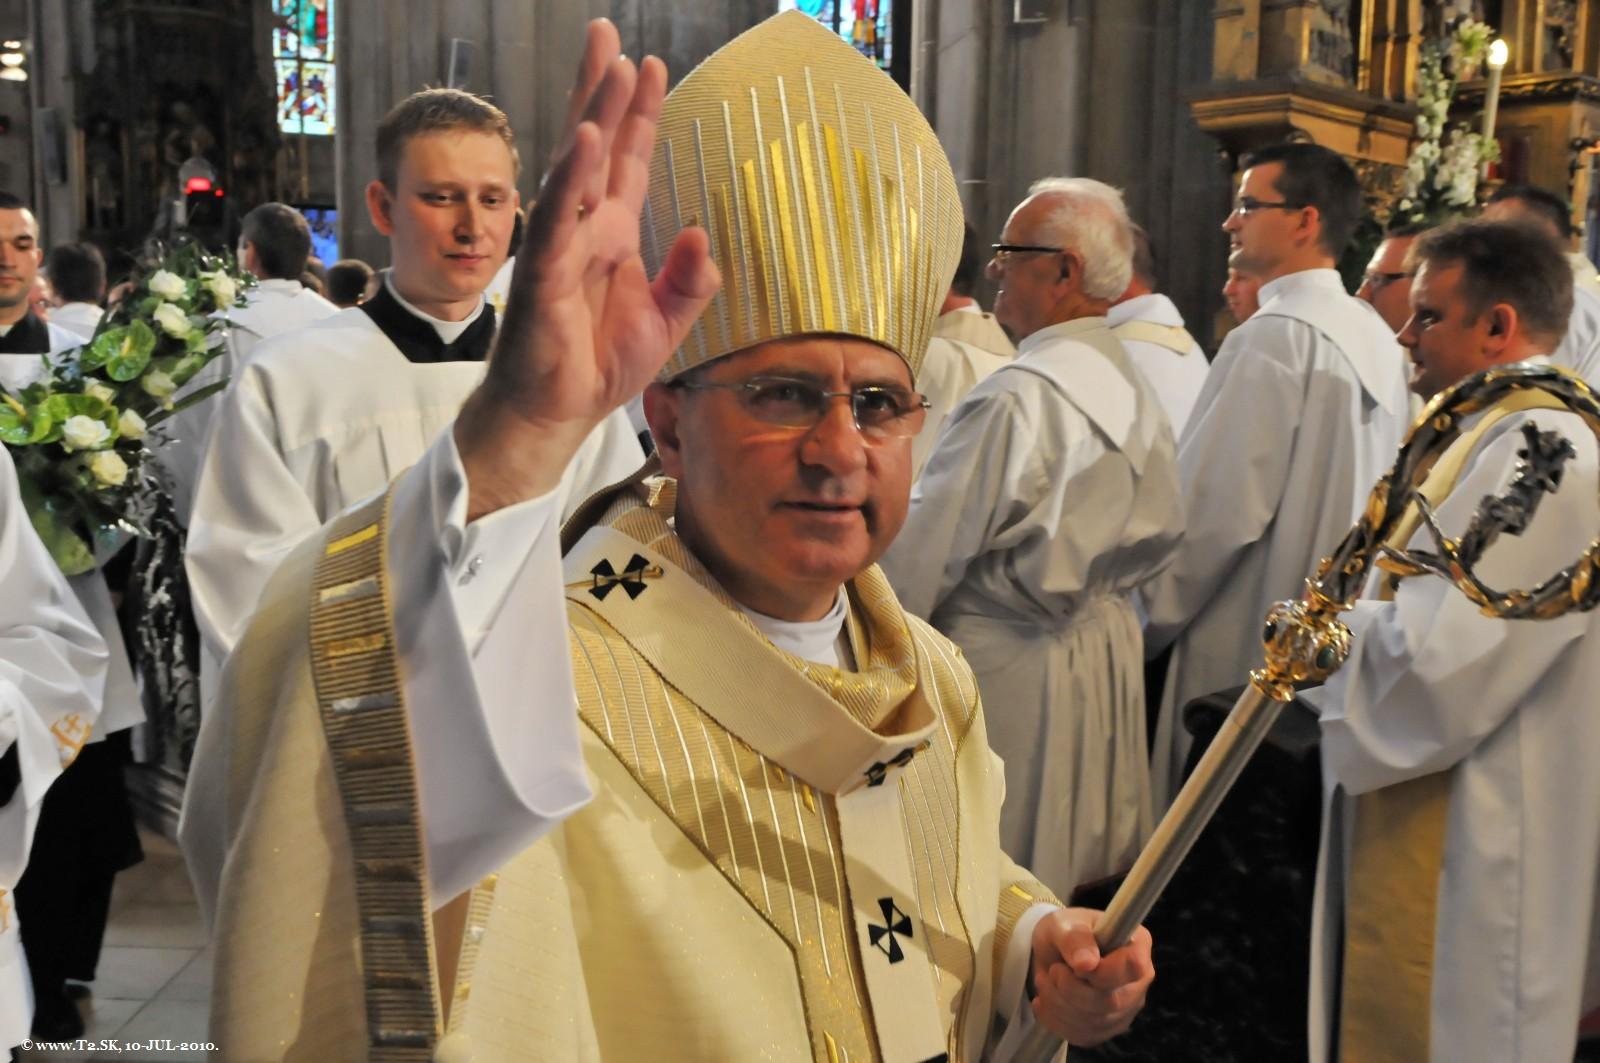 Nový arcibiskup Mons. Bernard Bober